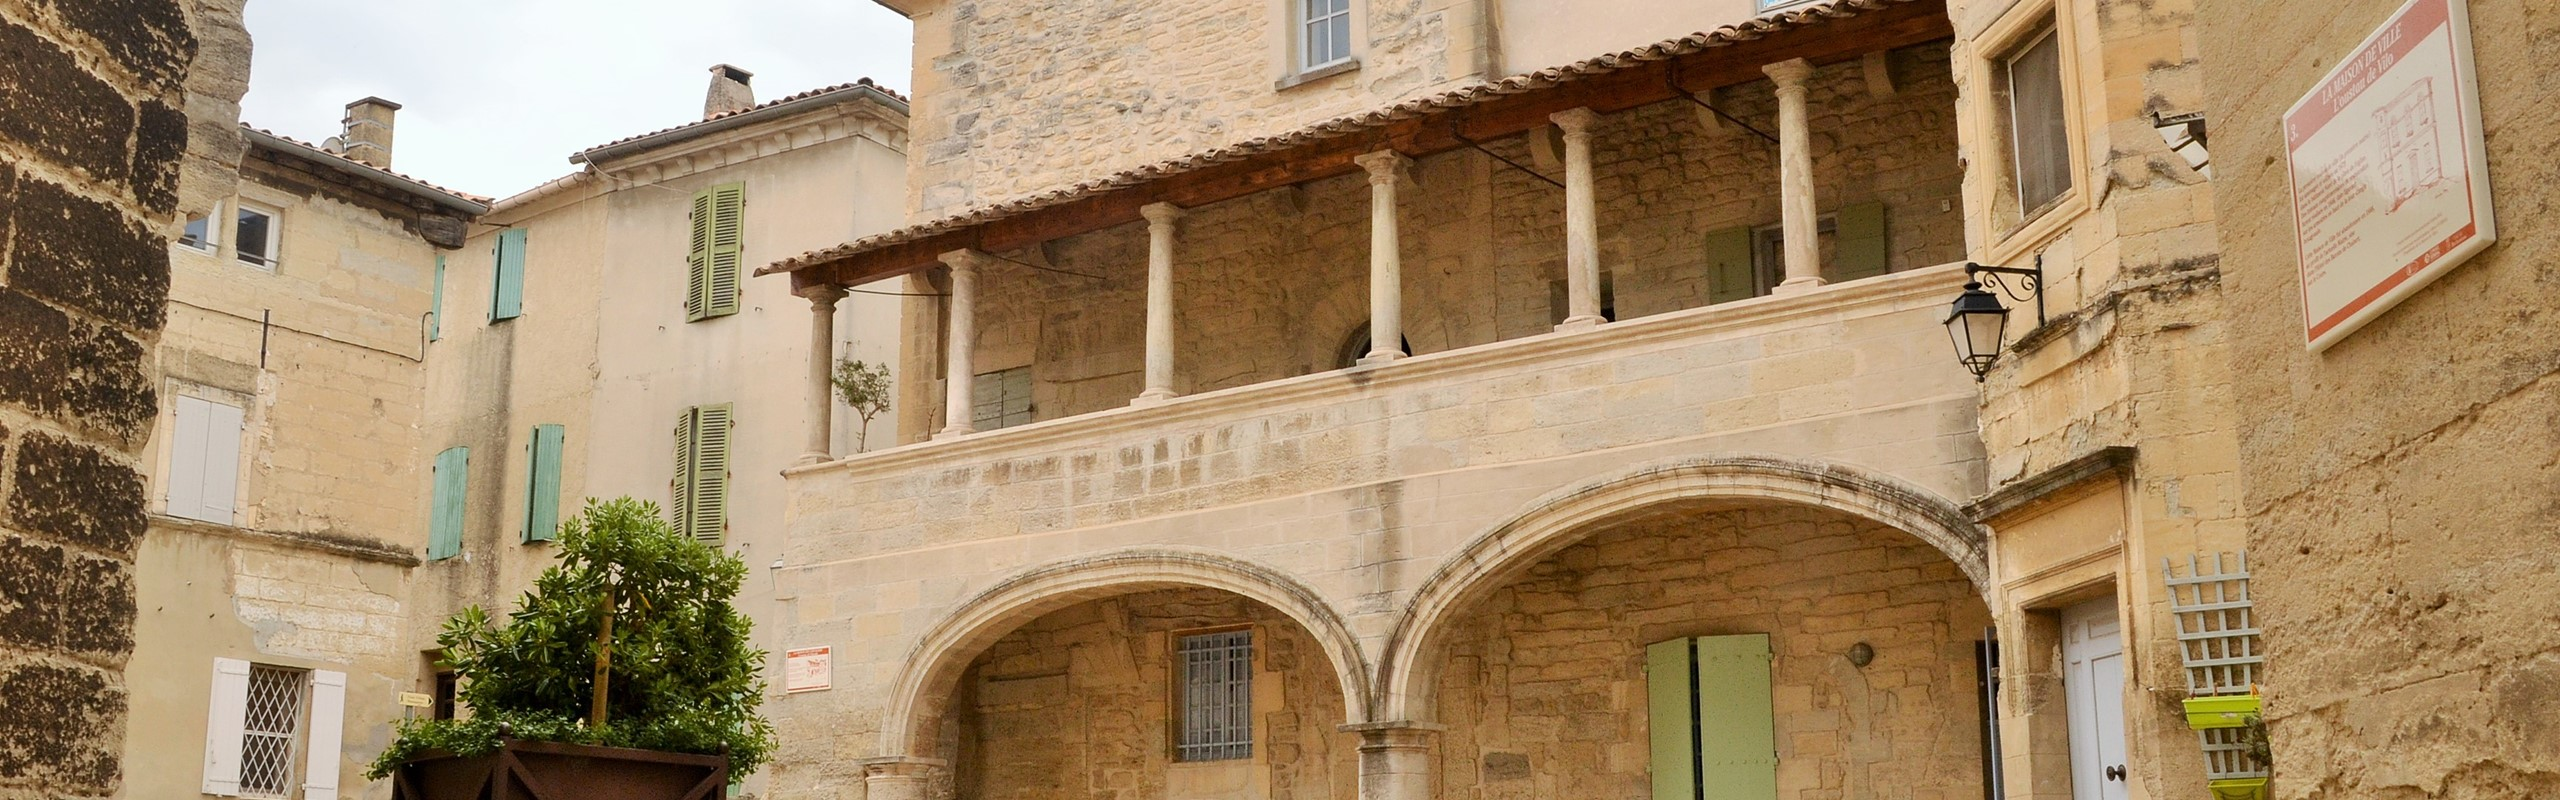 Barbentane Maison Des Chevaliers